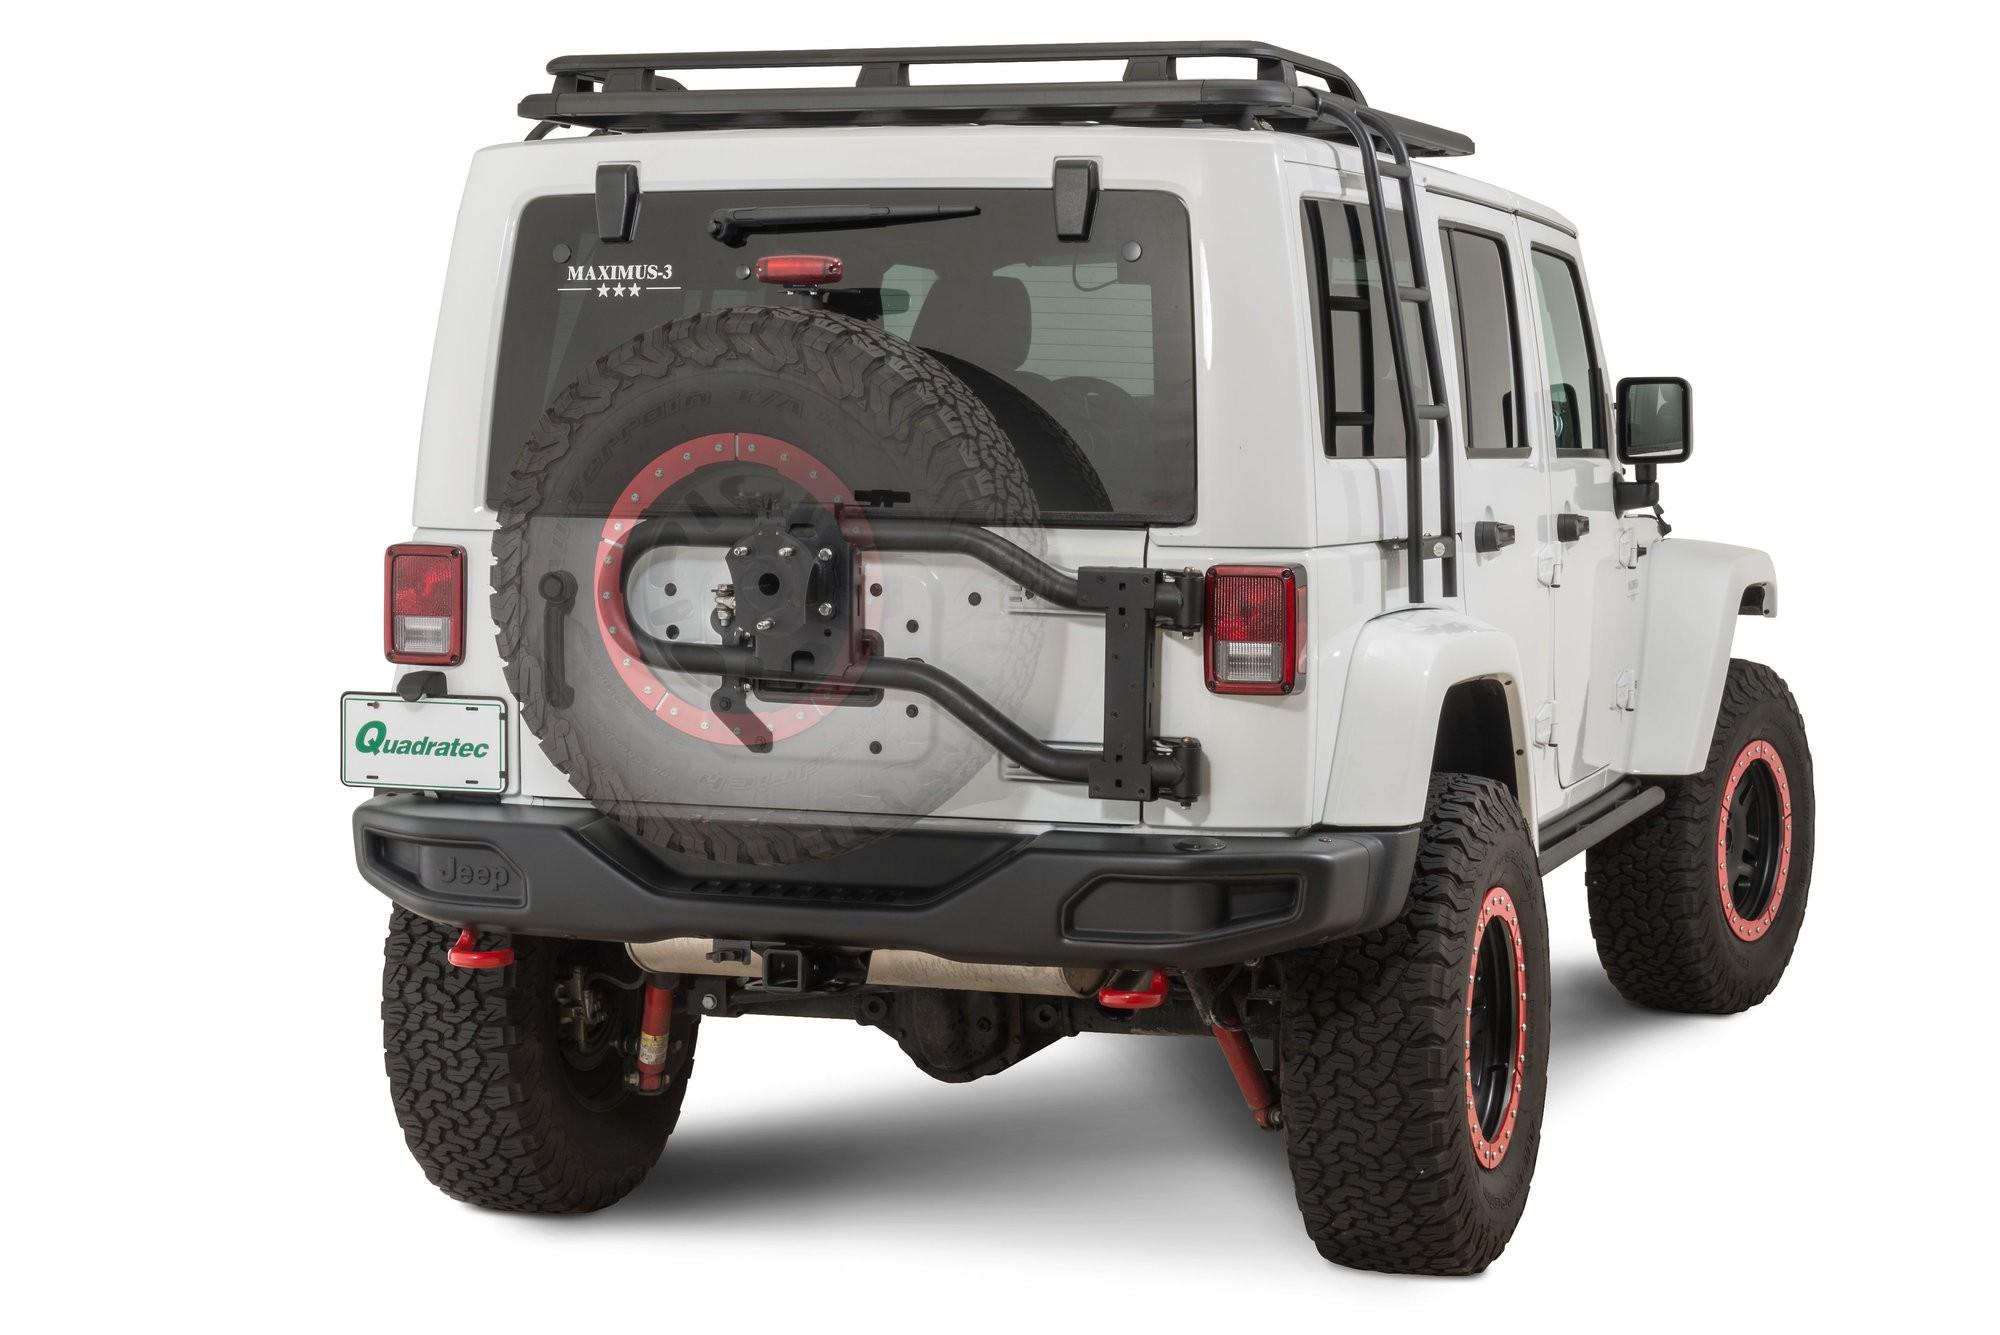 2004 Jeep Wrangler Parts Diagram Maximus 3 0400 0300tc Bp Modular Tire Carrier for 07 18 Jeep Of 2004 Jeep Wrangler Parts Diagram